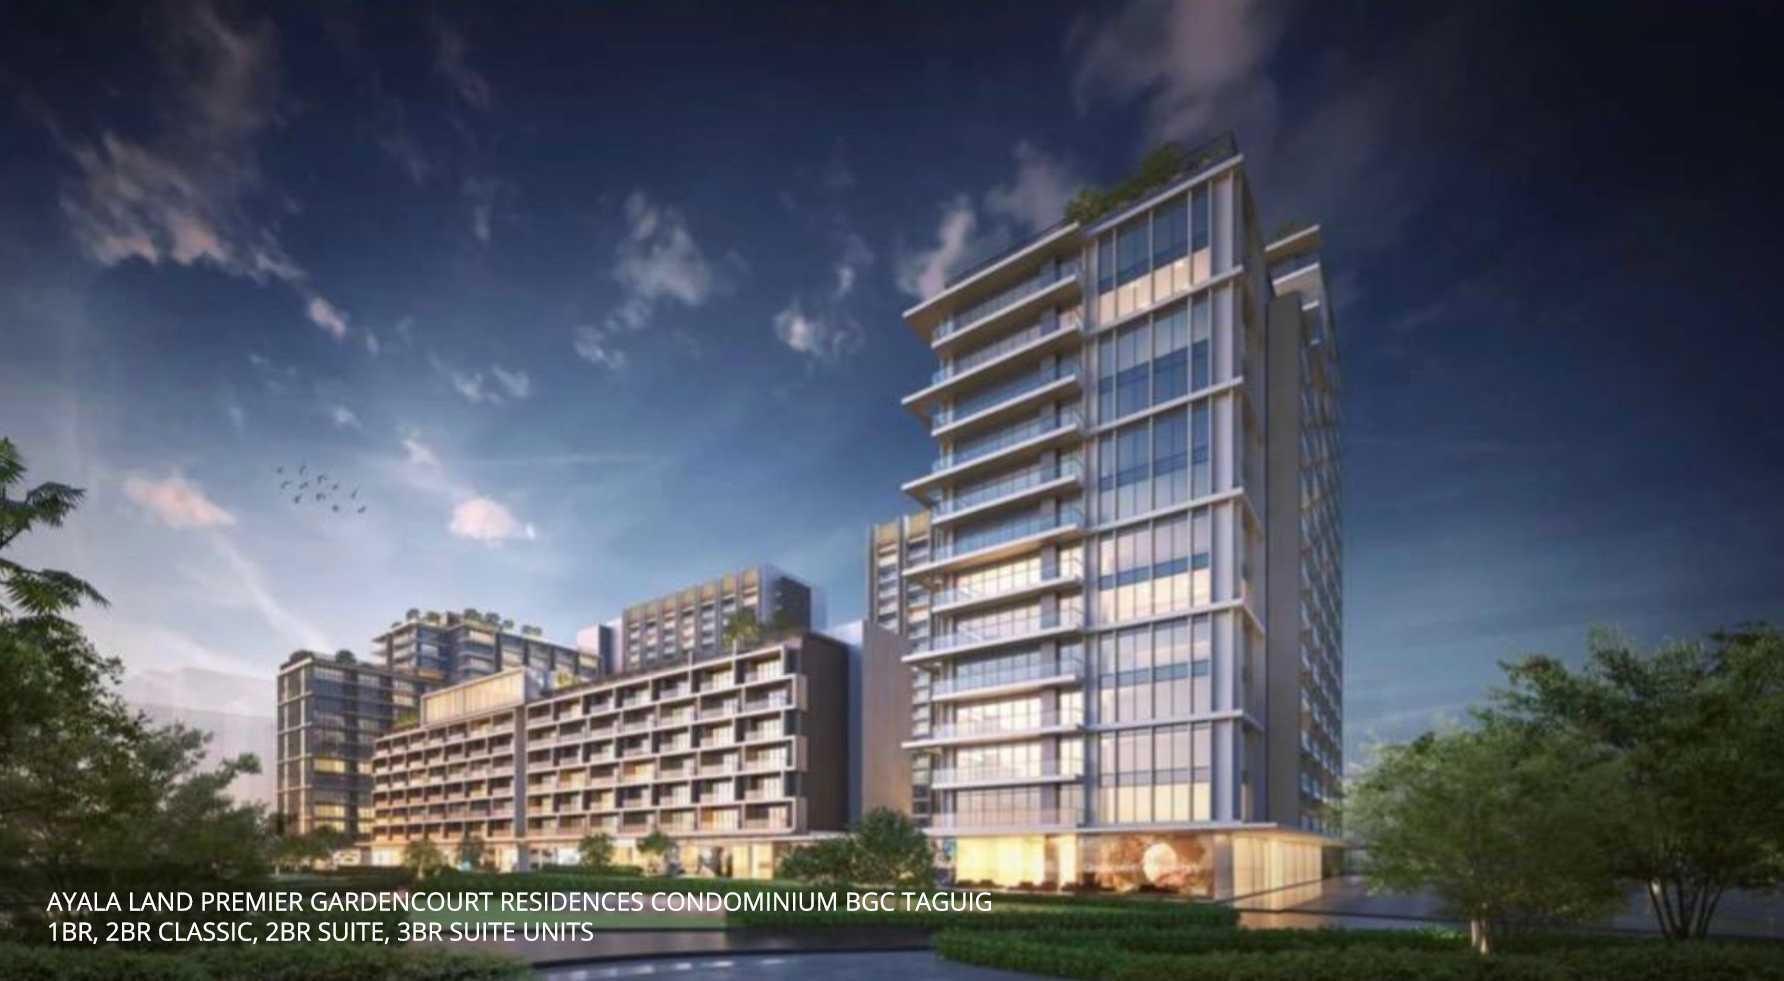 Gardencourt Residences Condominium BGC Taguig